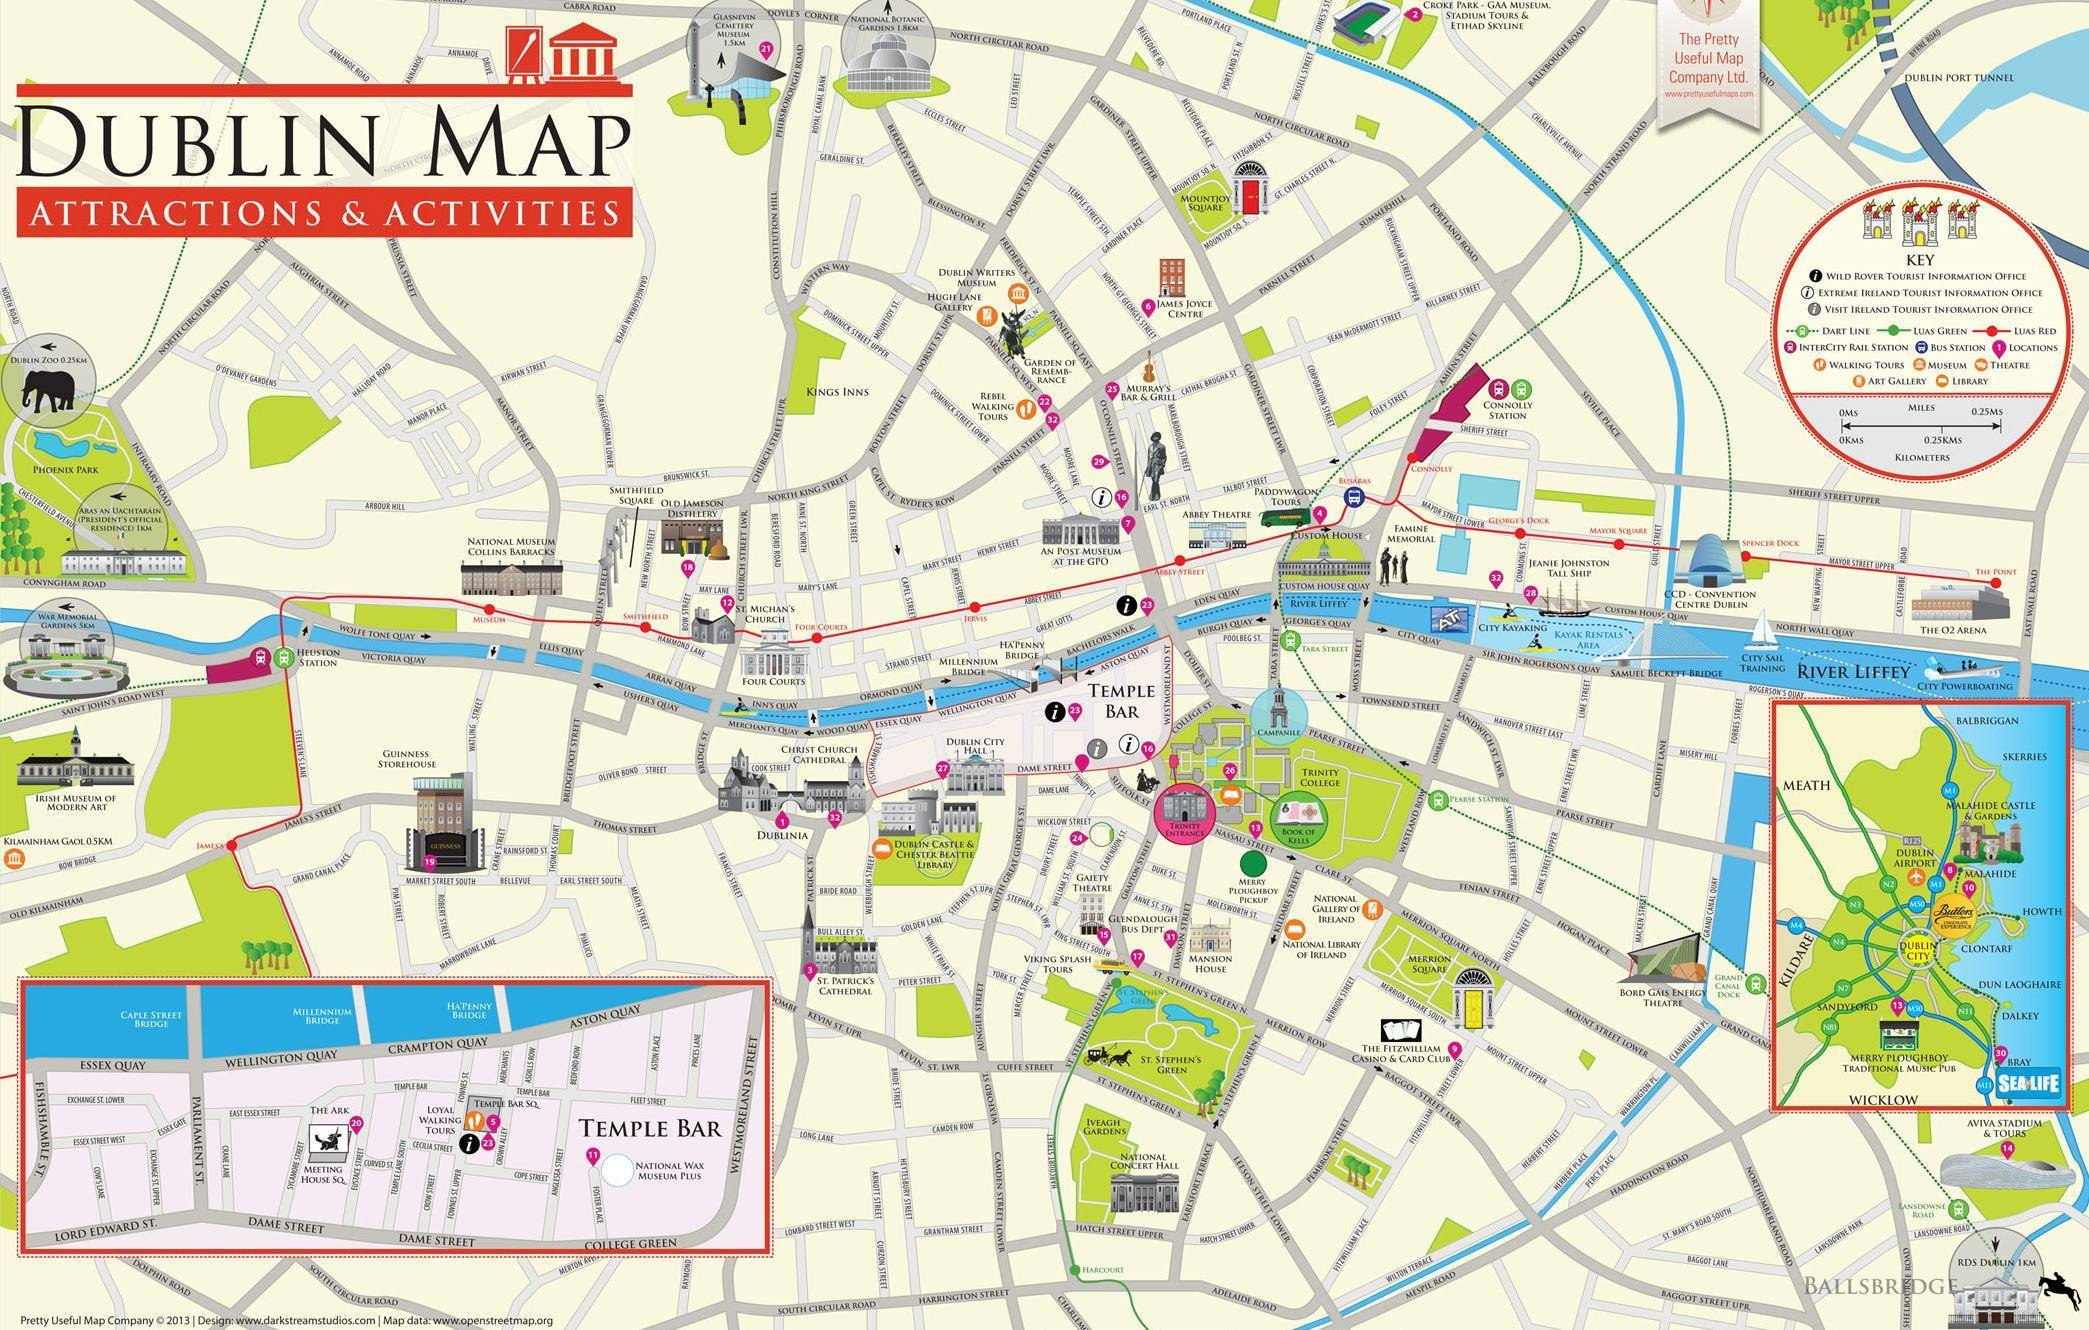 mappa dublino